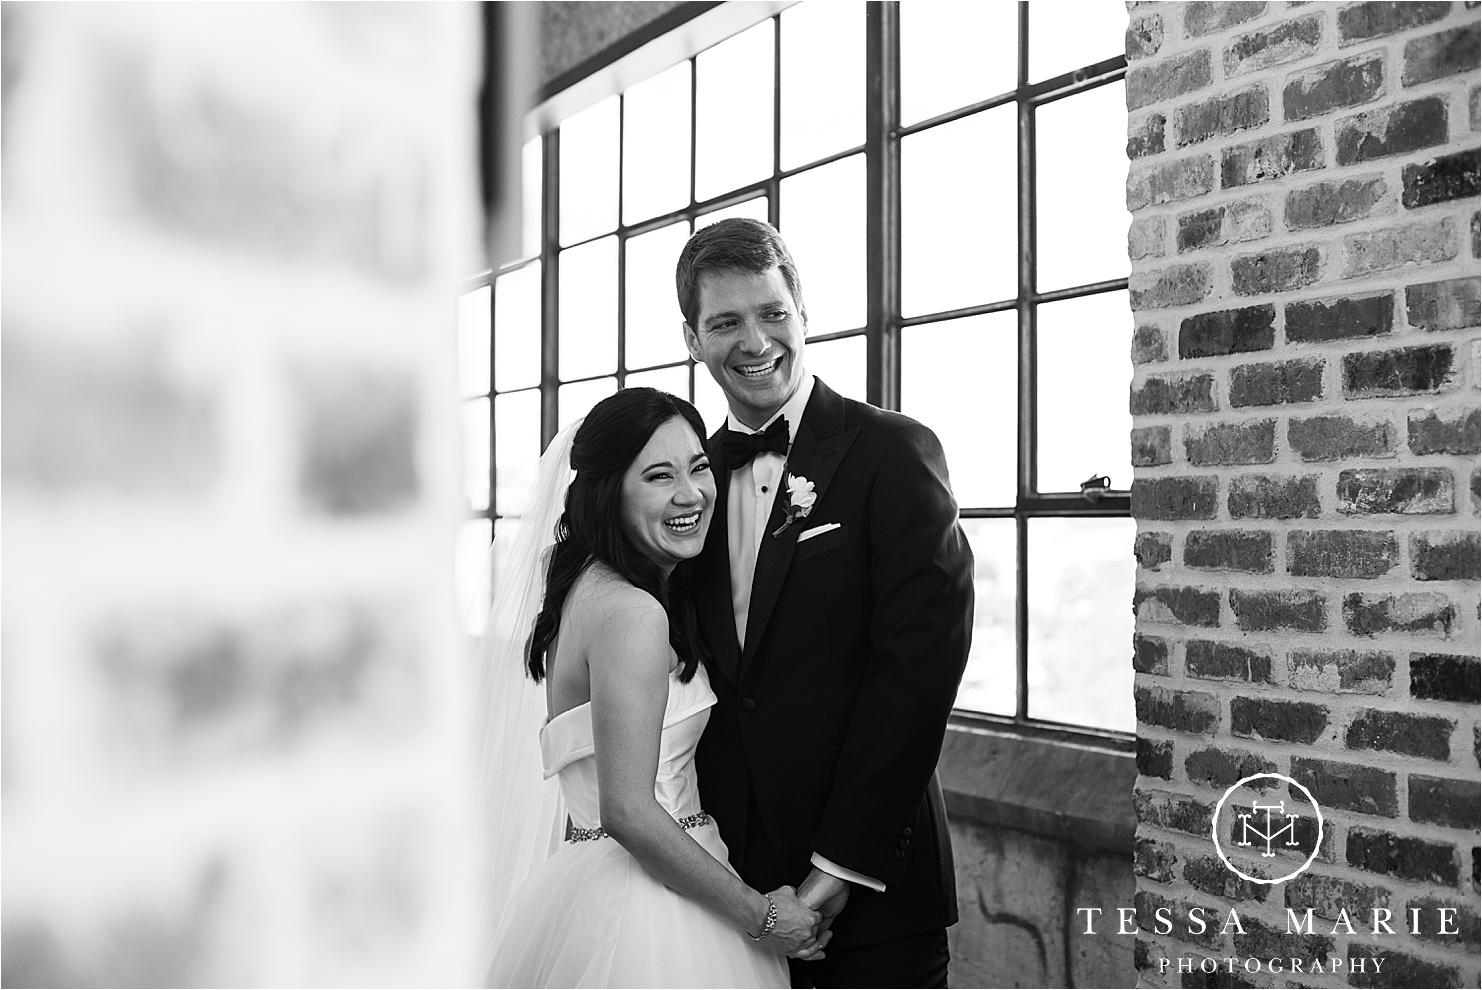 Tessa_marie_weddings_houston_wedding_photographer_The_astorian_0057.jpg